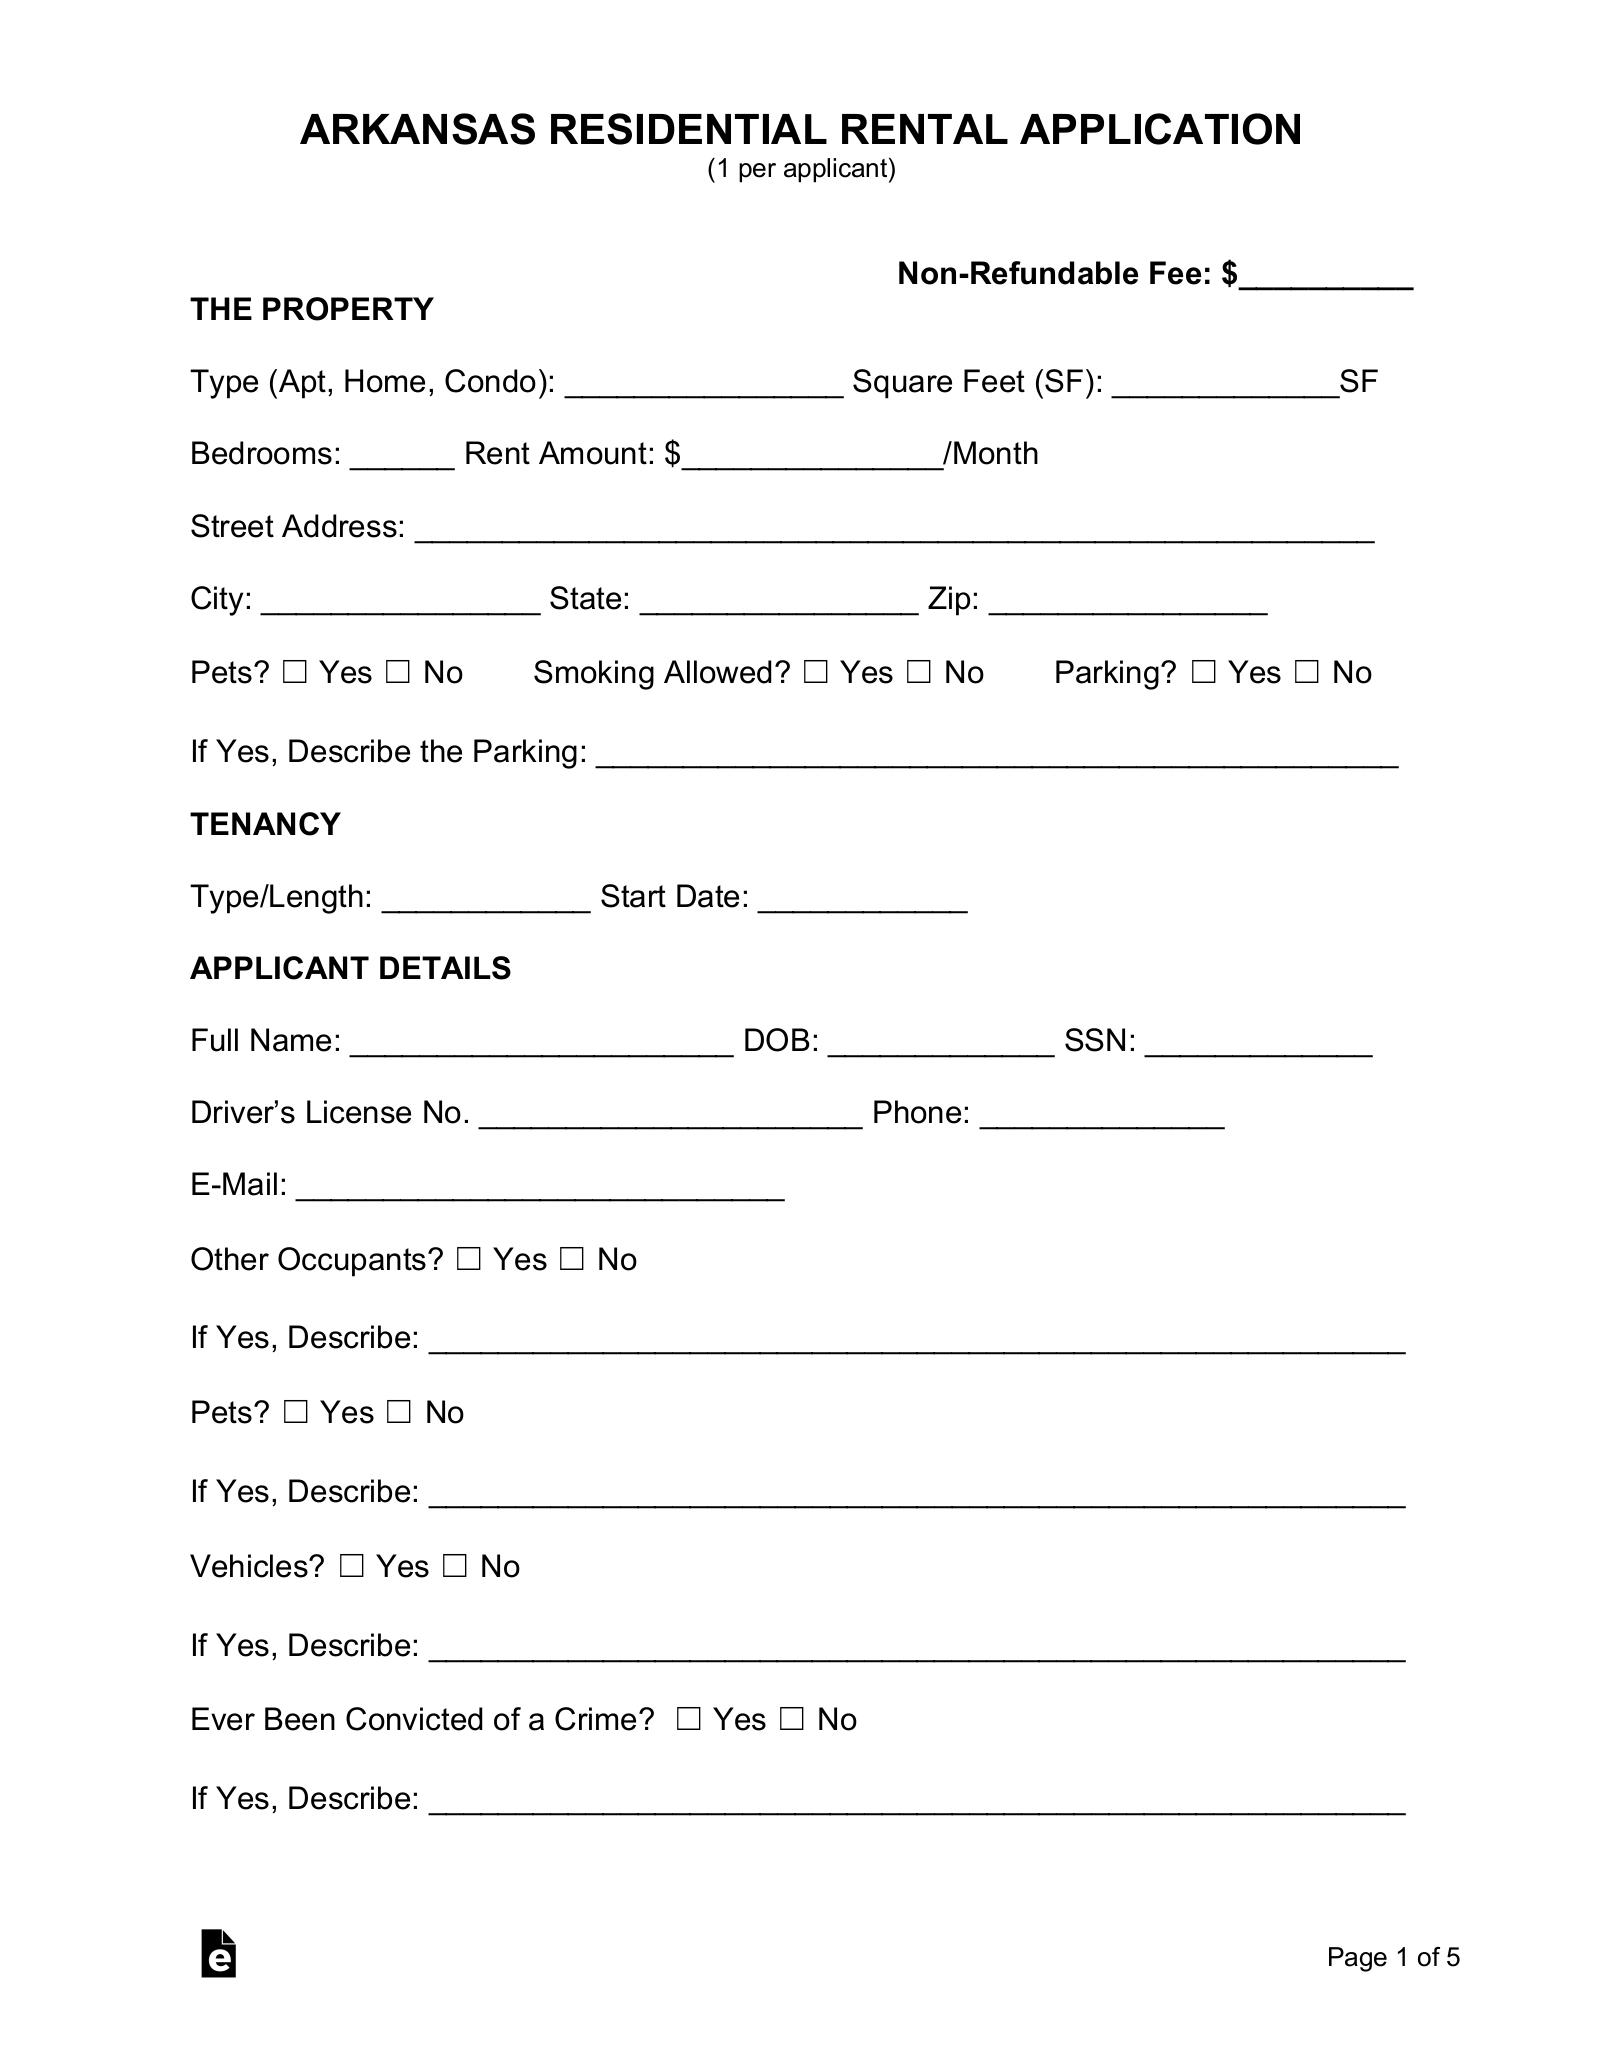 Free Arkansas Rental Application Form Pdf Eforms Free